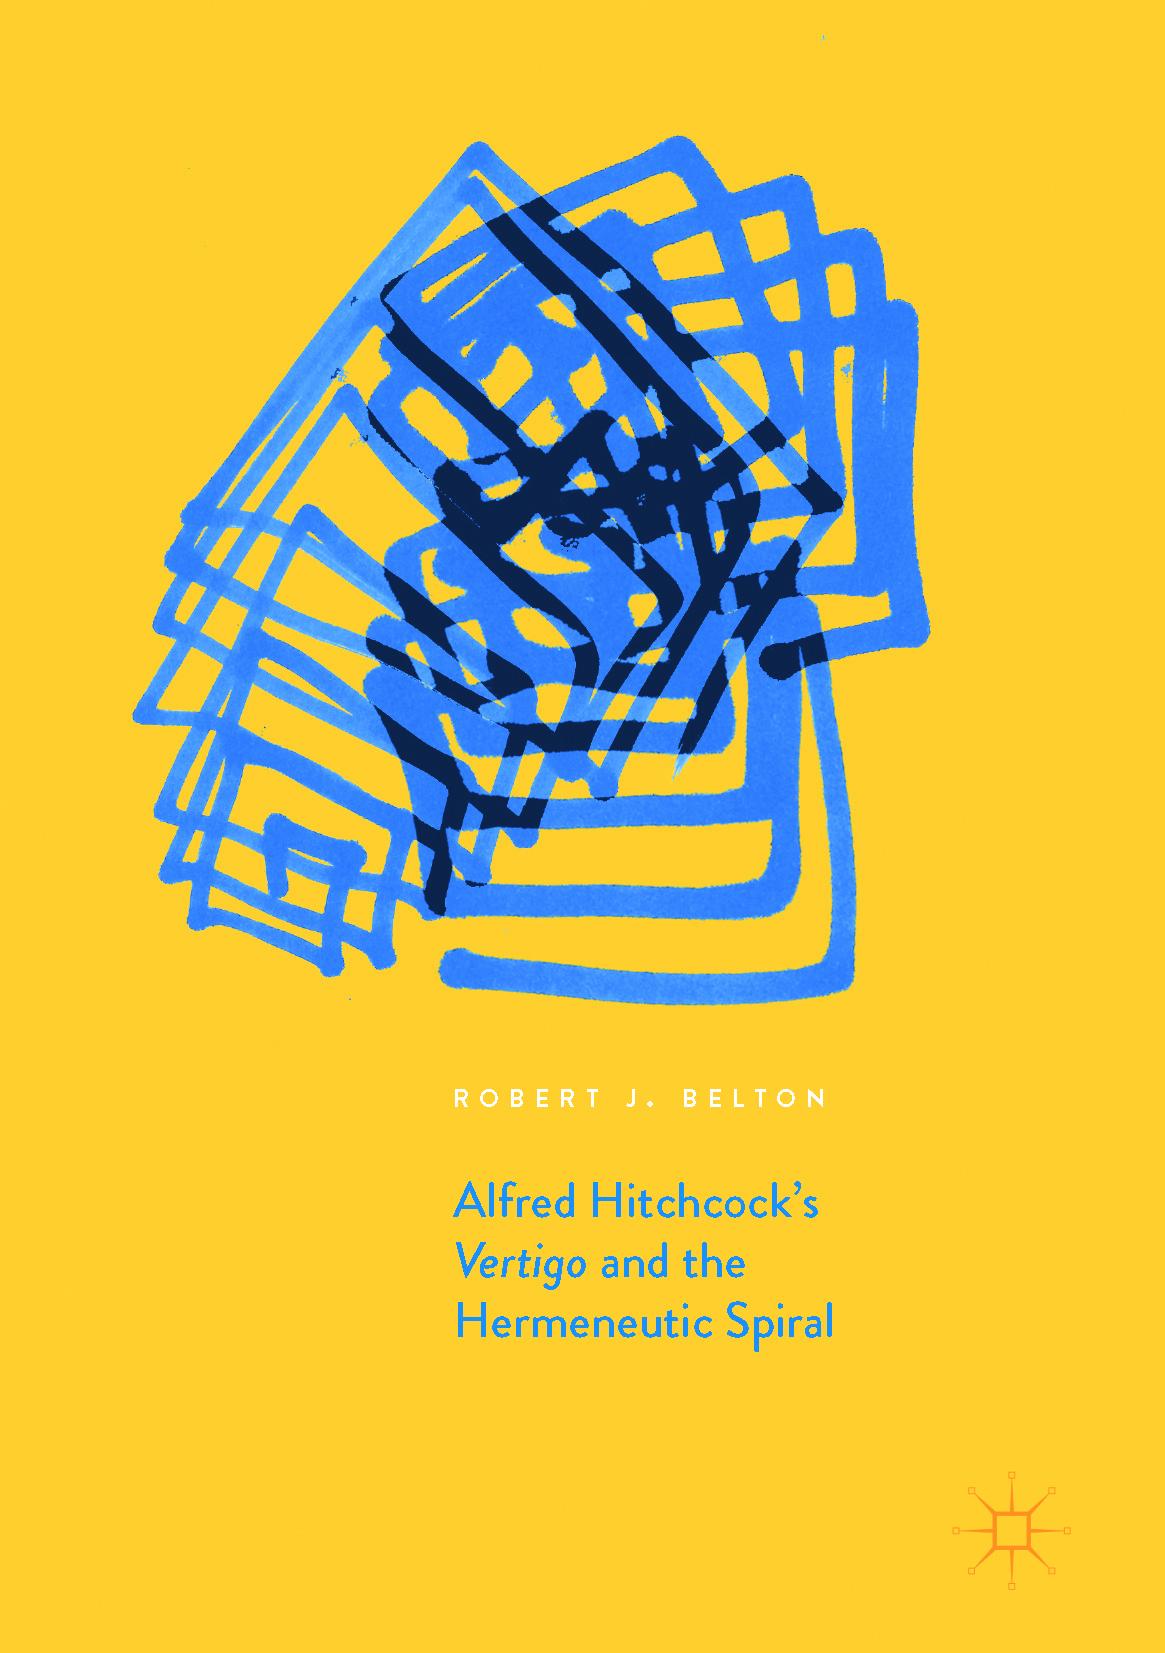 Belton, Robert J. - Alfred Hitchcock's Vertigo and the Hermeneutic Spiral, ebook